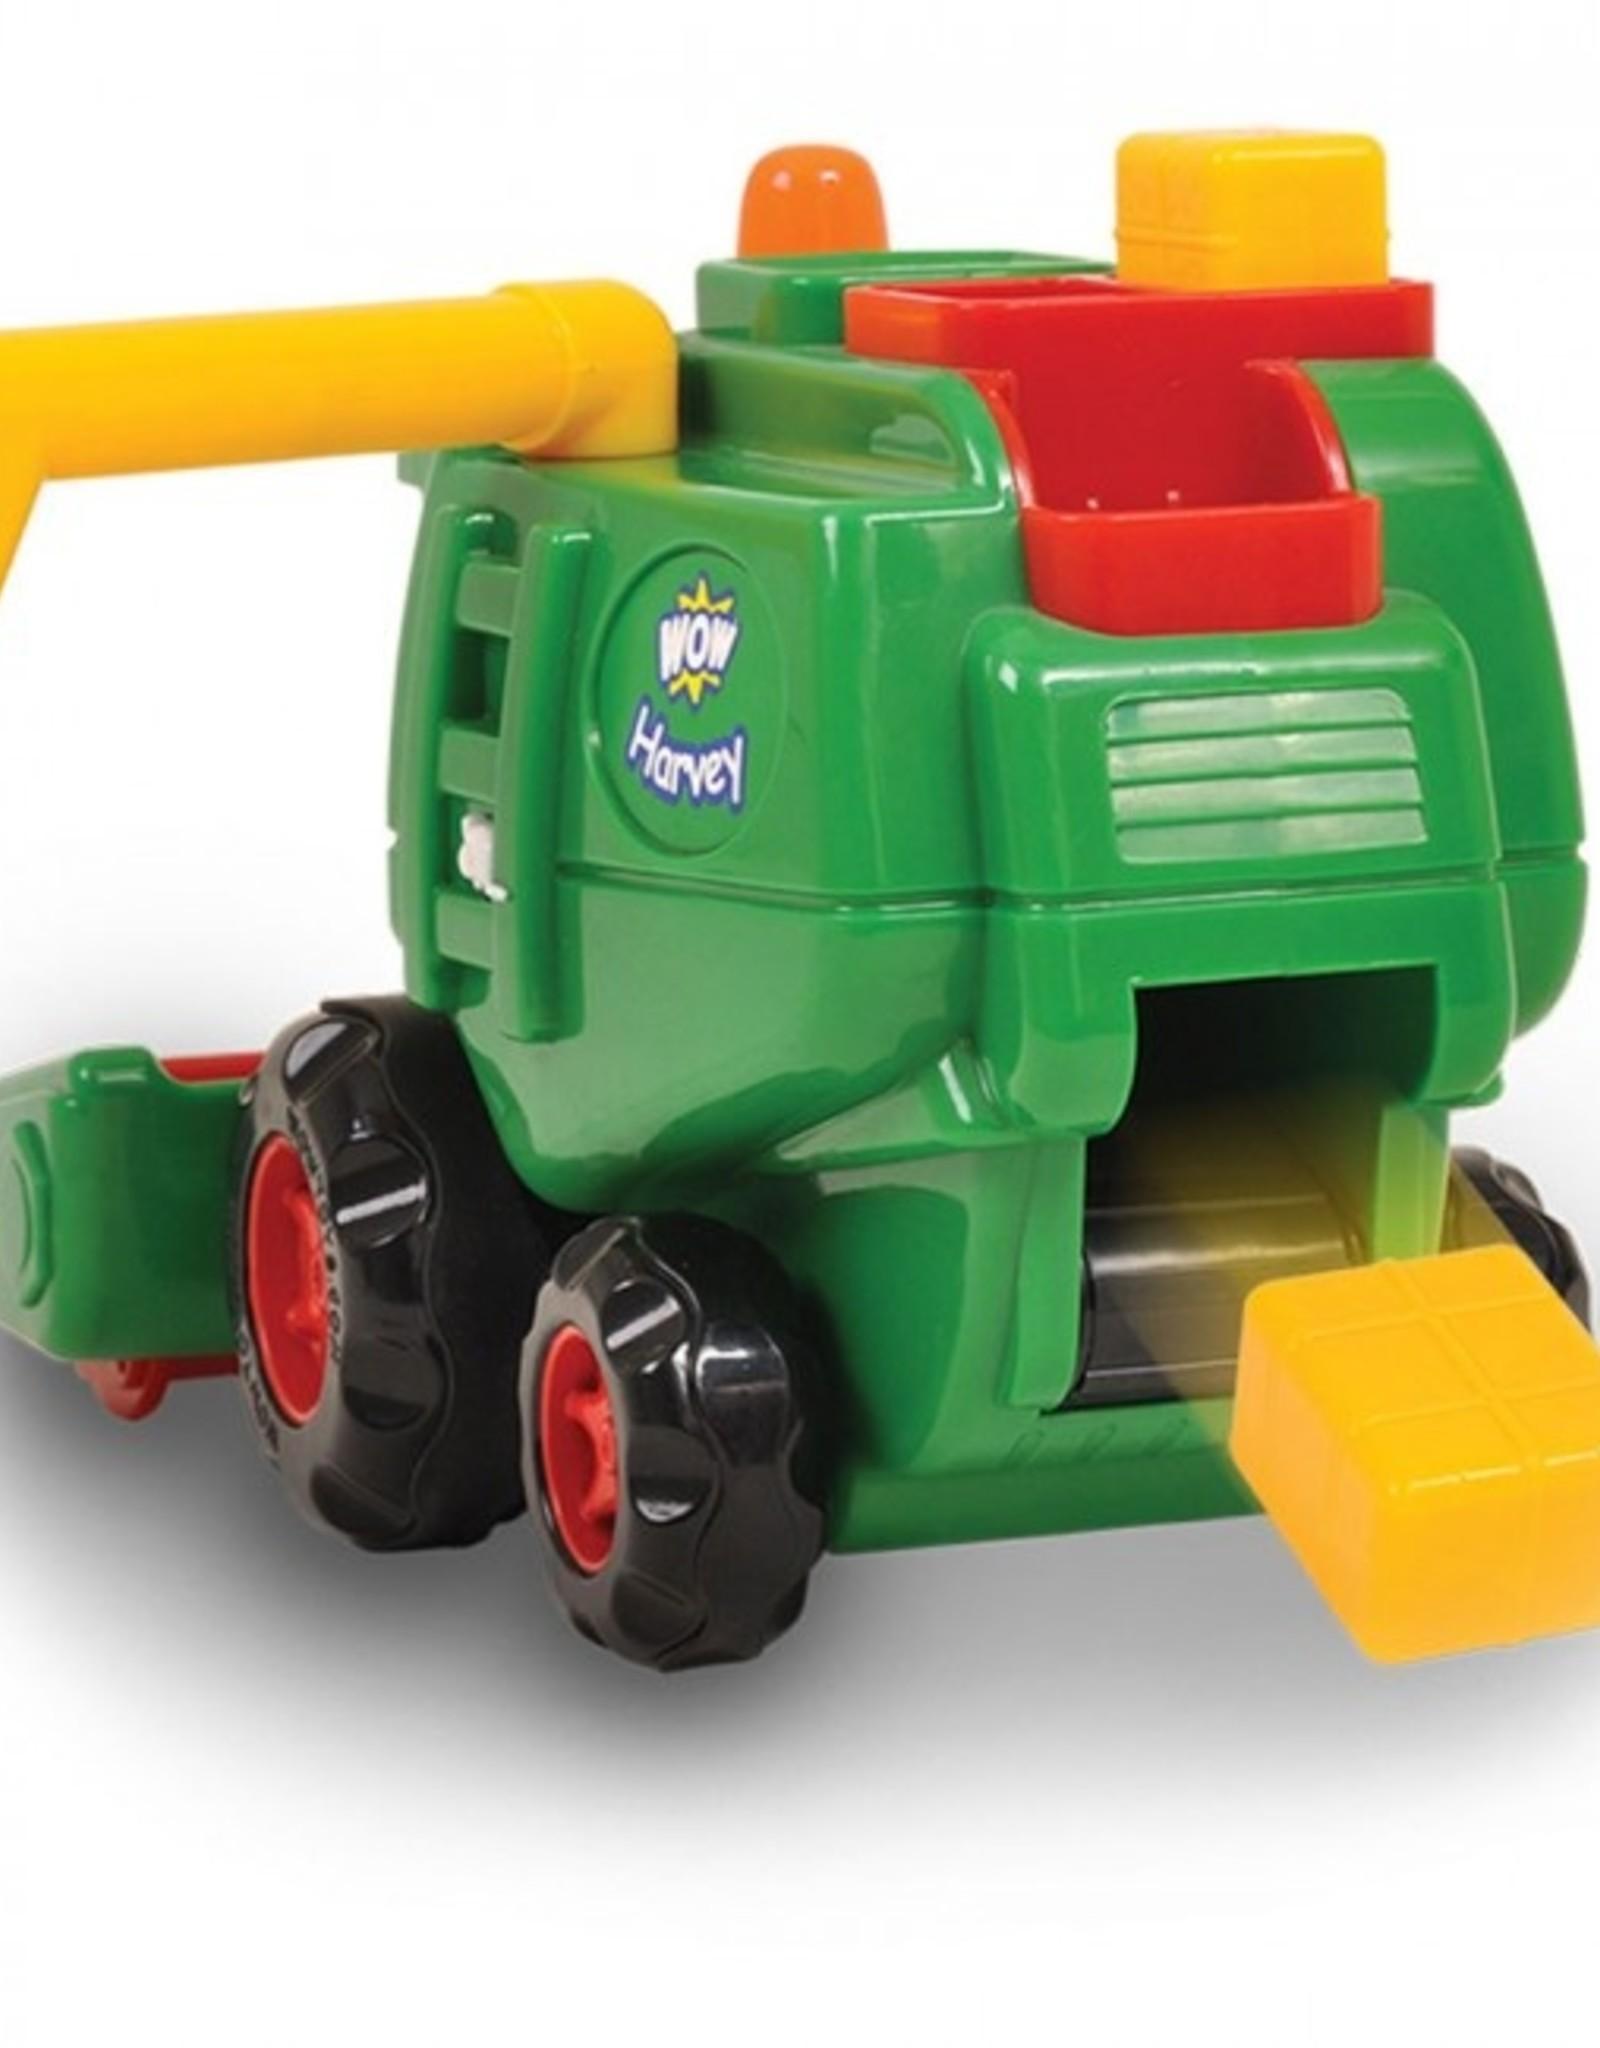 WOW Toys Harvey Harvester